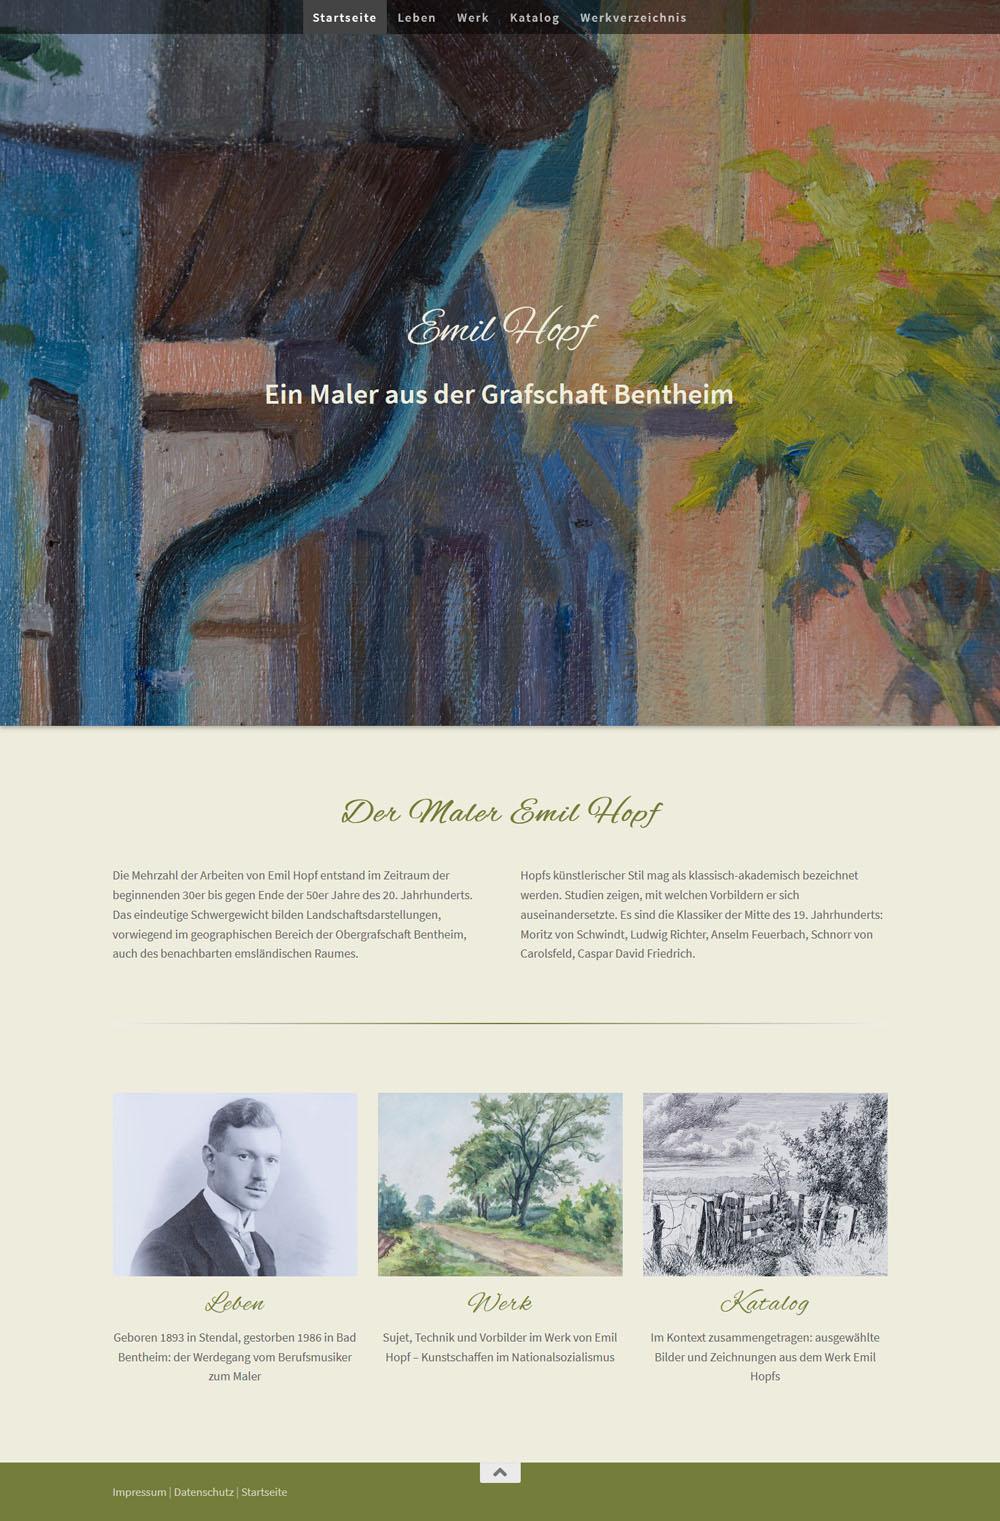 Der Maler Emil Hopf